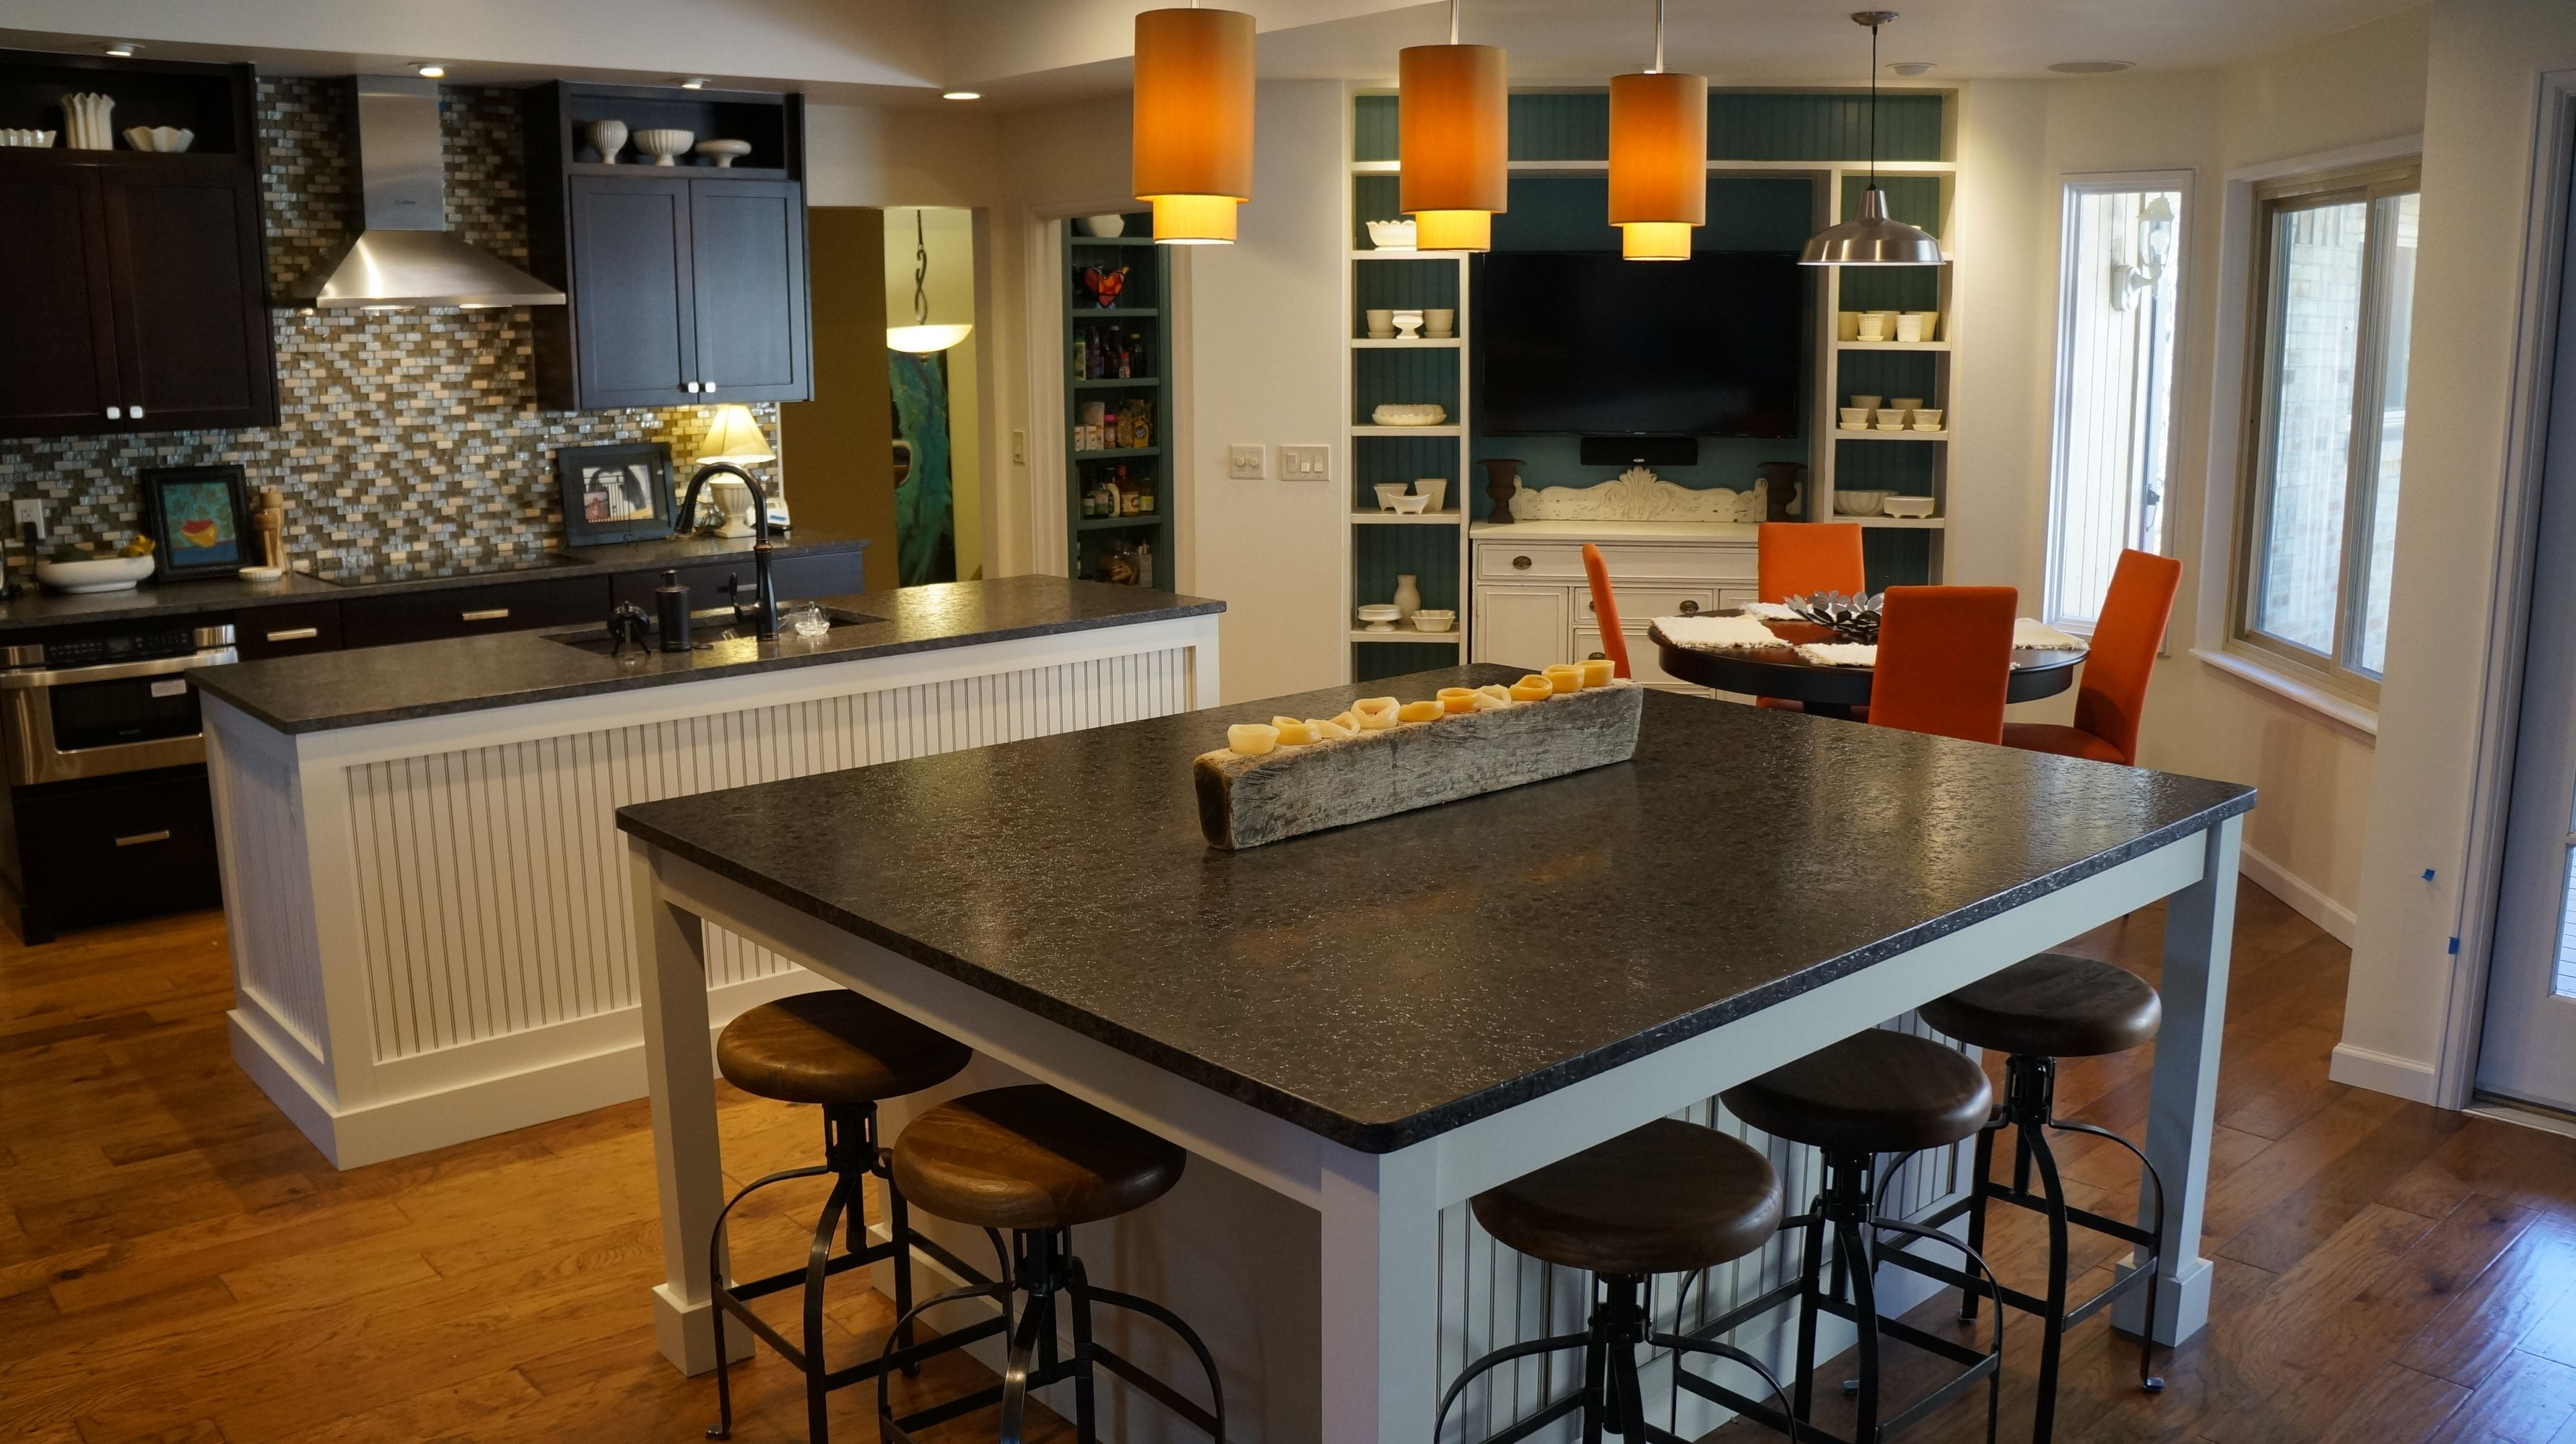 Bathroom Furniture Kitchen Remodel Denver bkc kitchen and bath denver remodel medallion cabinetry potters mill door style with